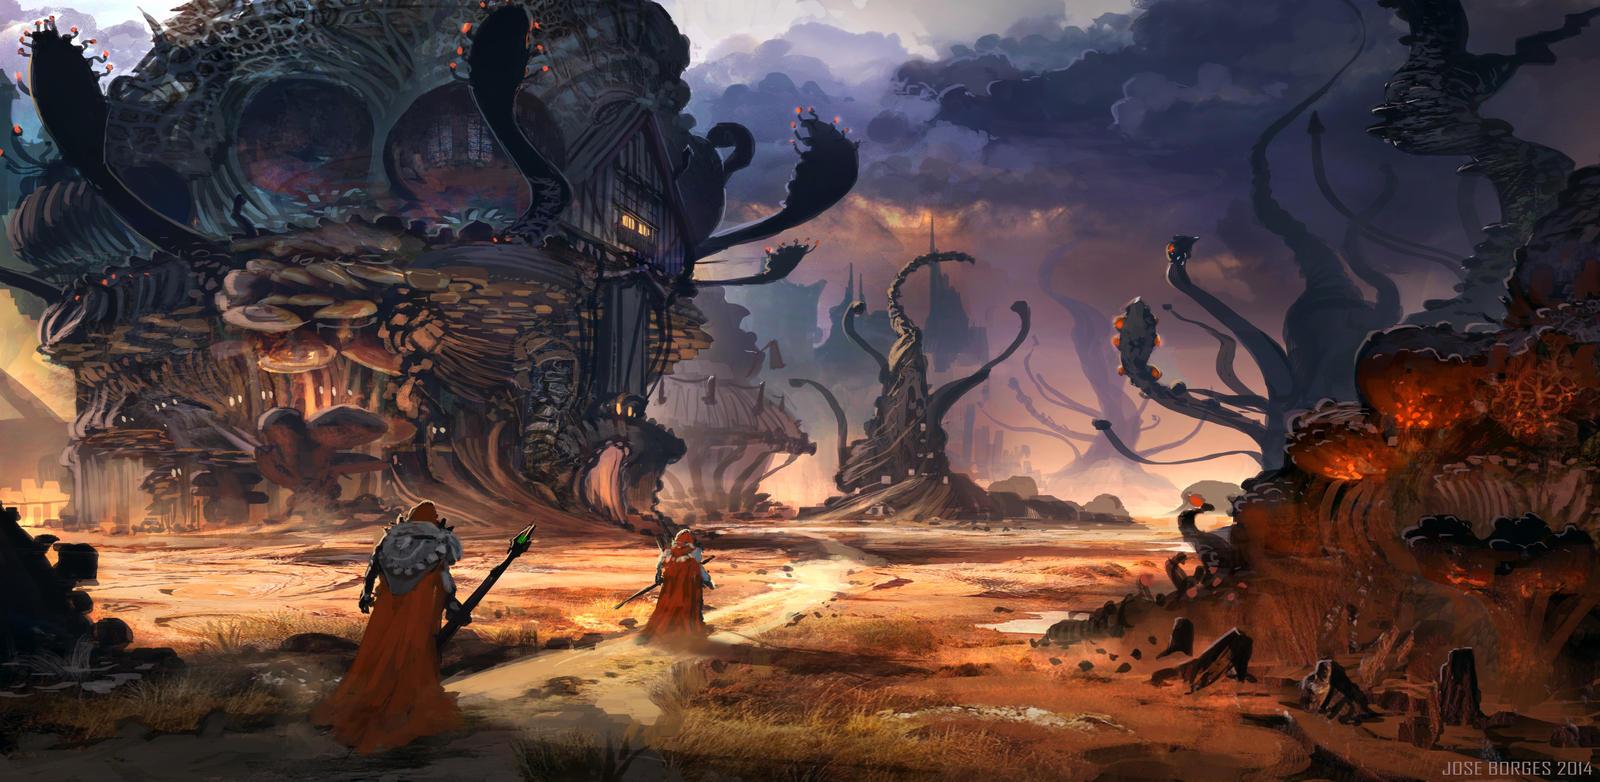 Desolation by whatzitoya